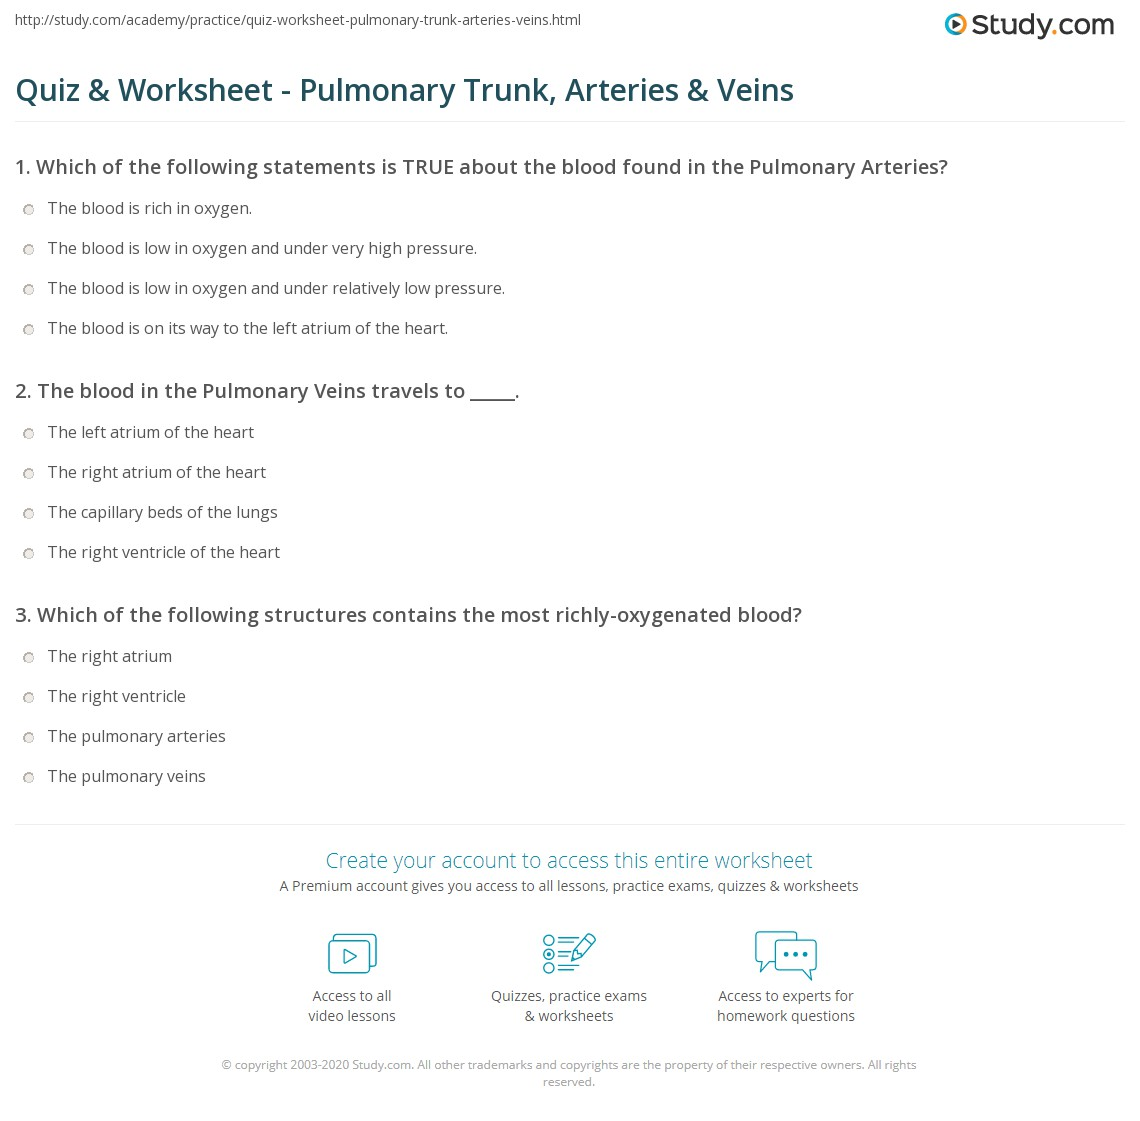 quiz worksheet pulmonary trunk arteries veins. Black Bedroom Furniture Sets. Home Design Ideas